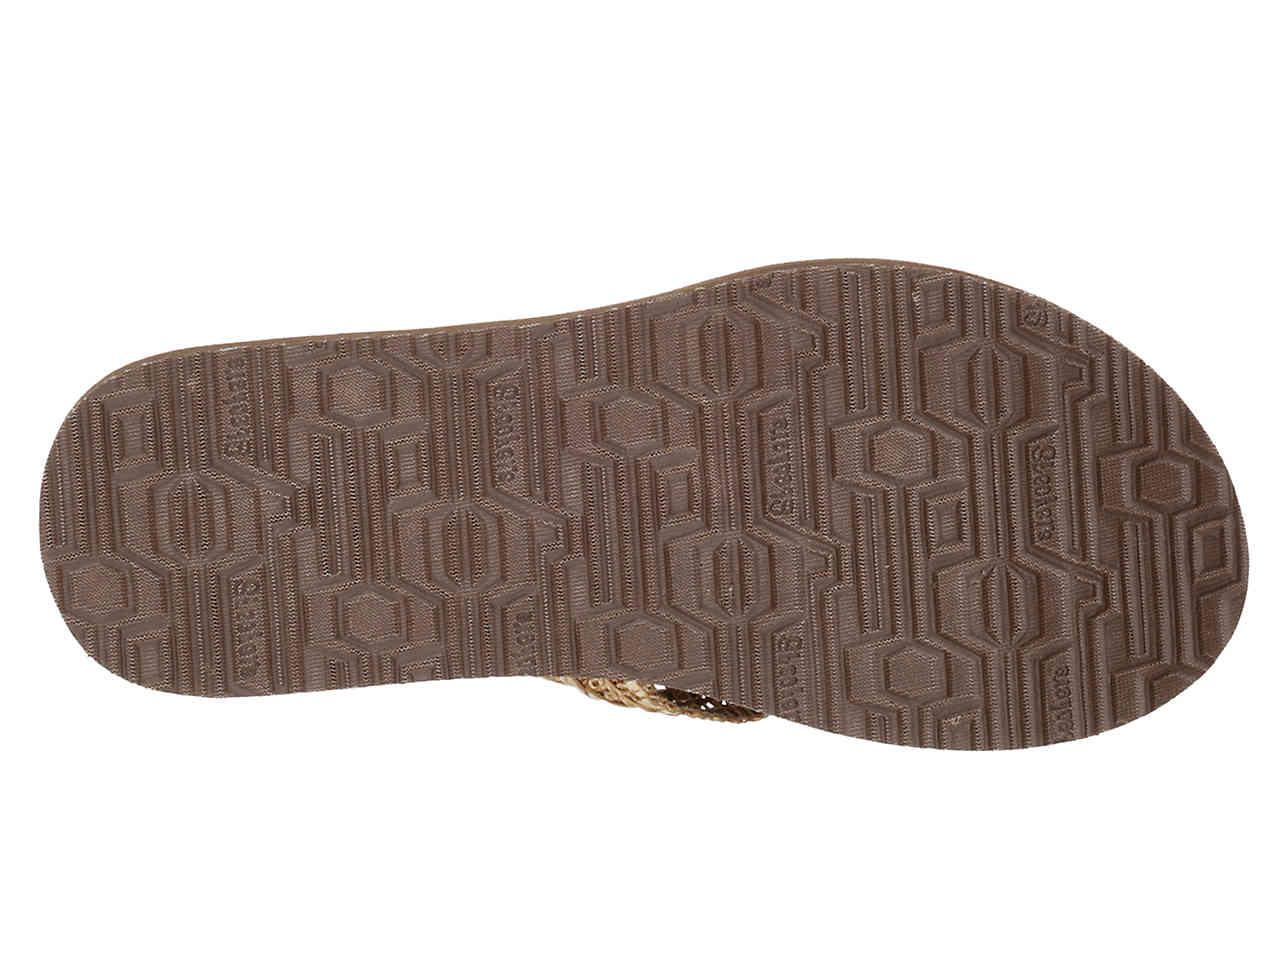 f17a45d6fad2 Lyst - Skechers Zen Summer Flip Flop in Natural